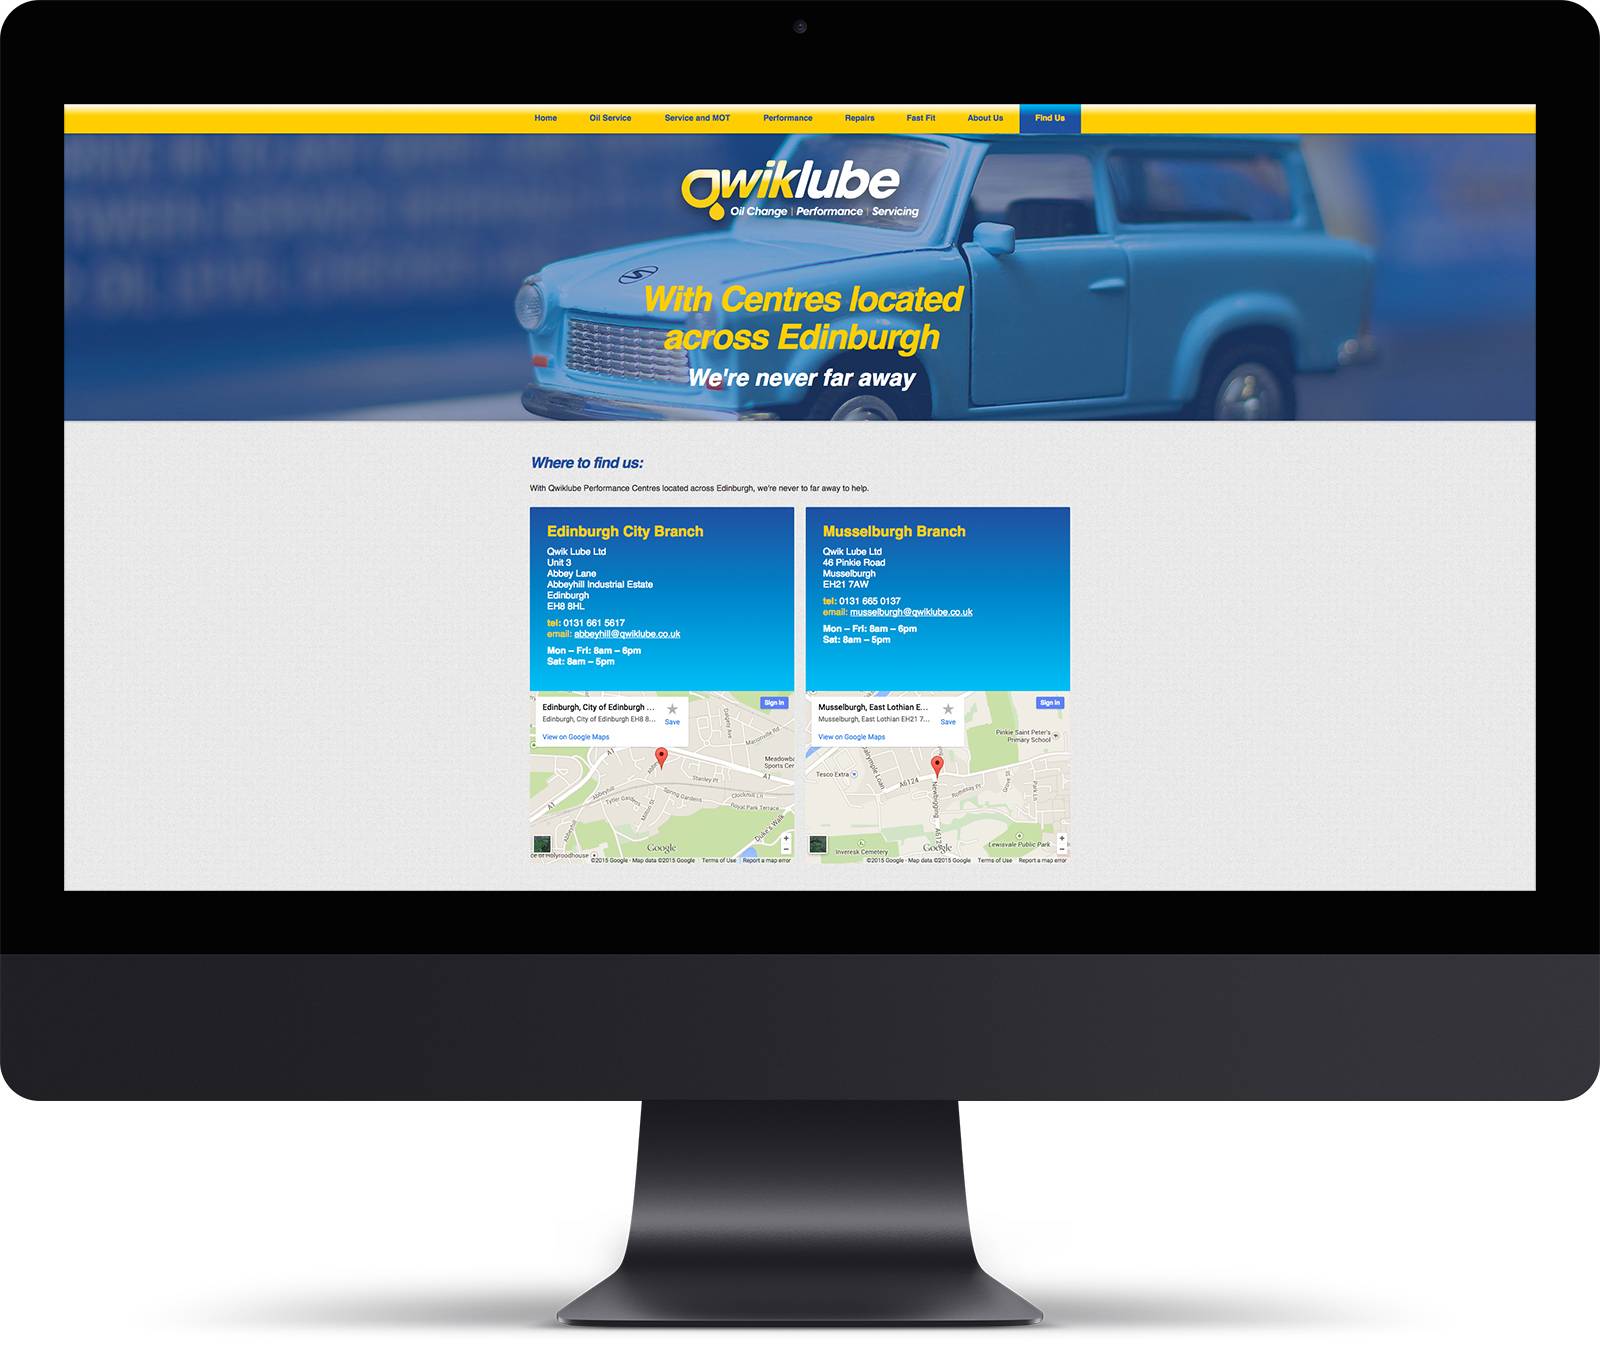 qwiklube website